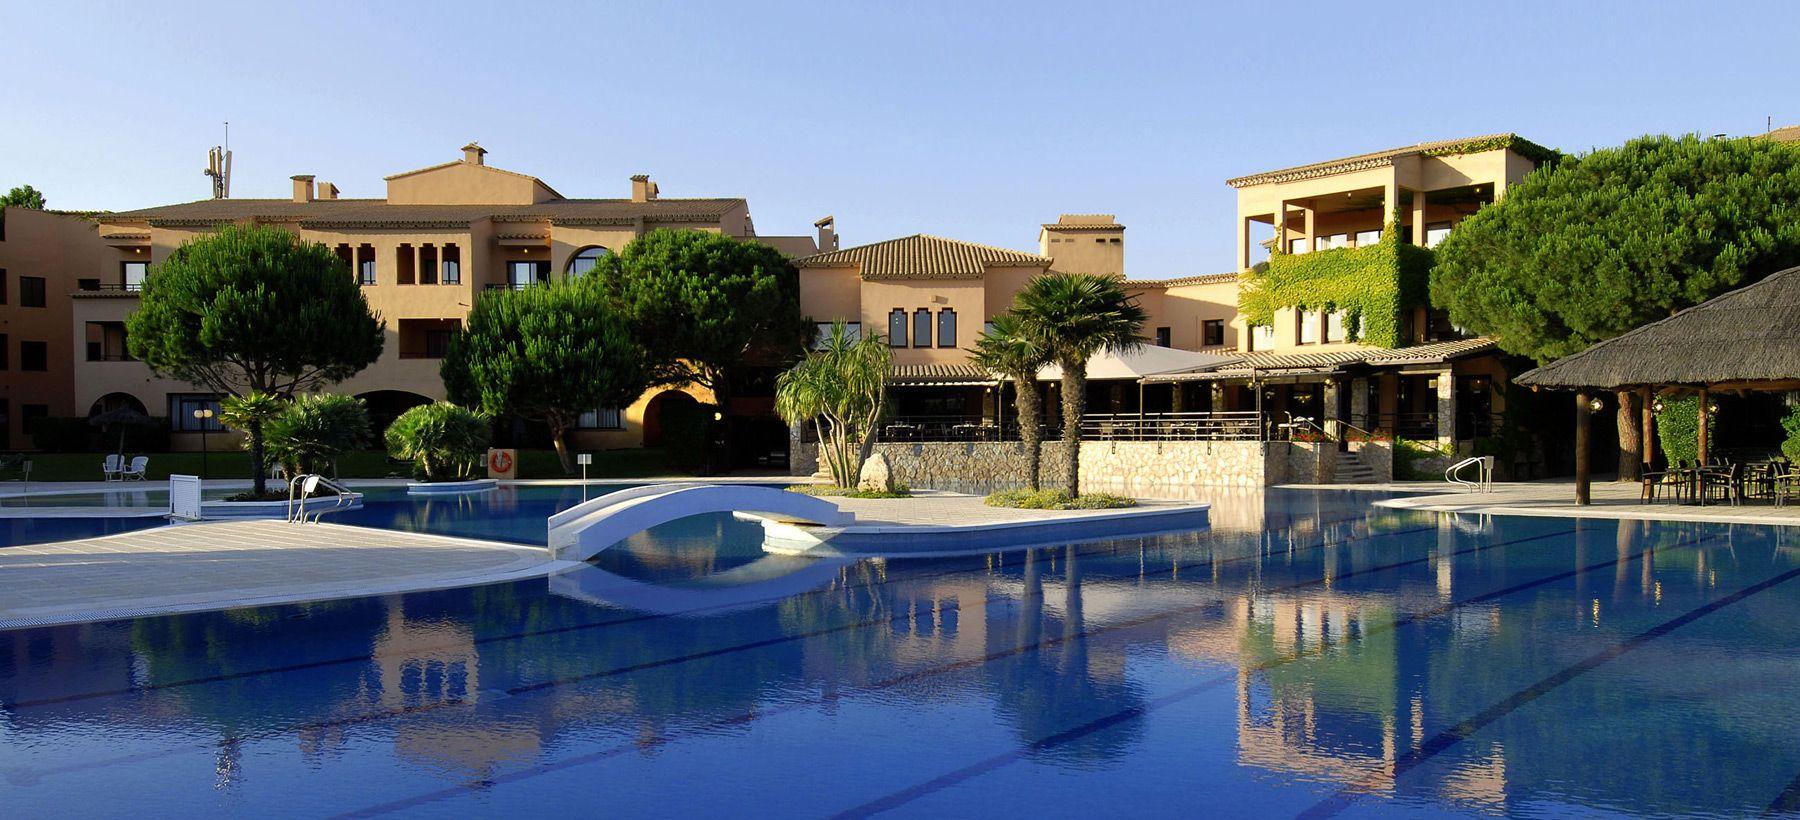 Resort La Costa Golf Beach Hotel Costa Brava Golf Golf Costa Brava Resort Golf Beach Spain Lodging Golf Costa Brava Hotel Pals Hotell